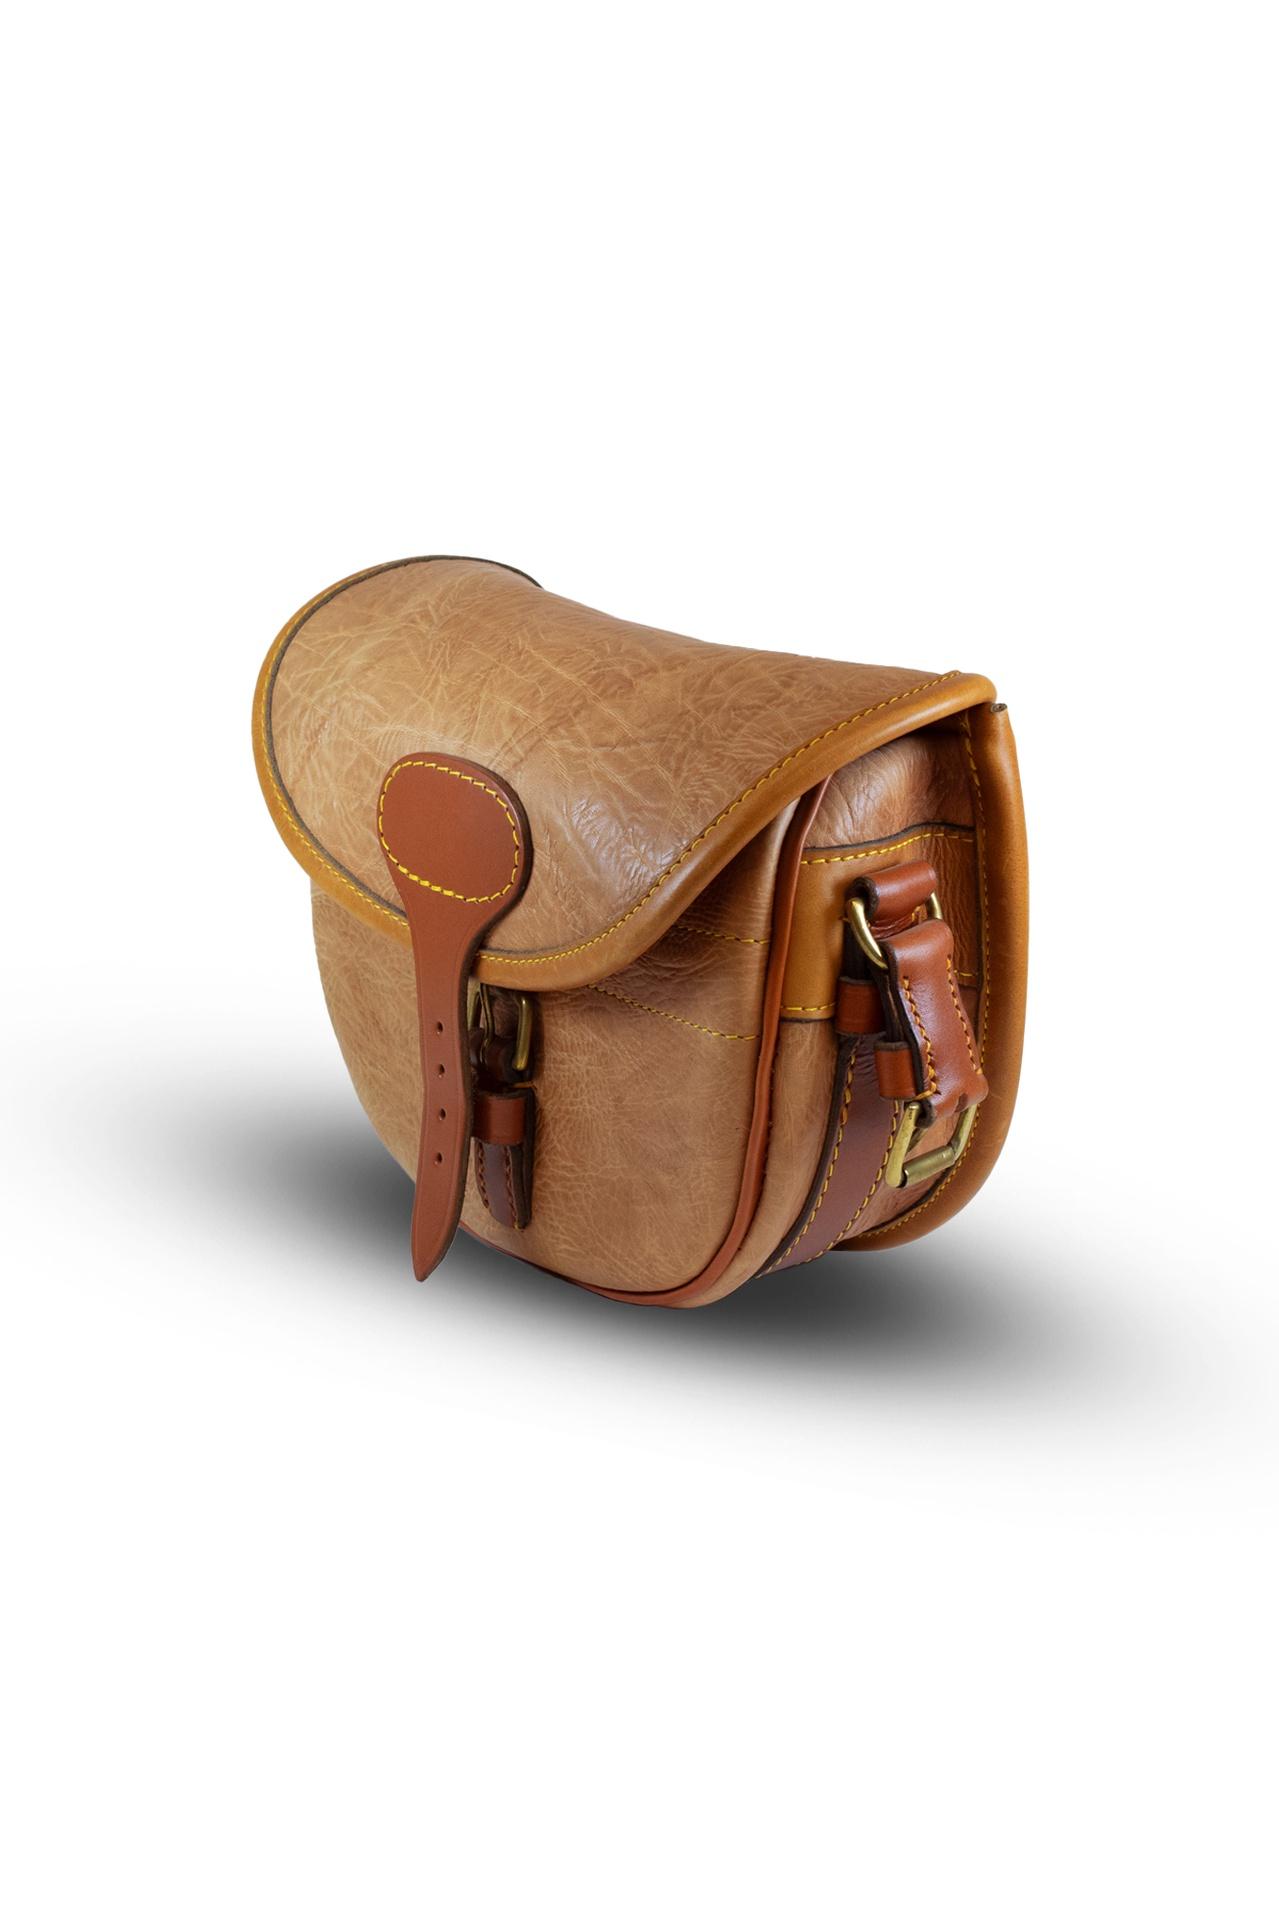 Best Leather Cartridge Bag (100) – Light Tan